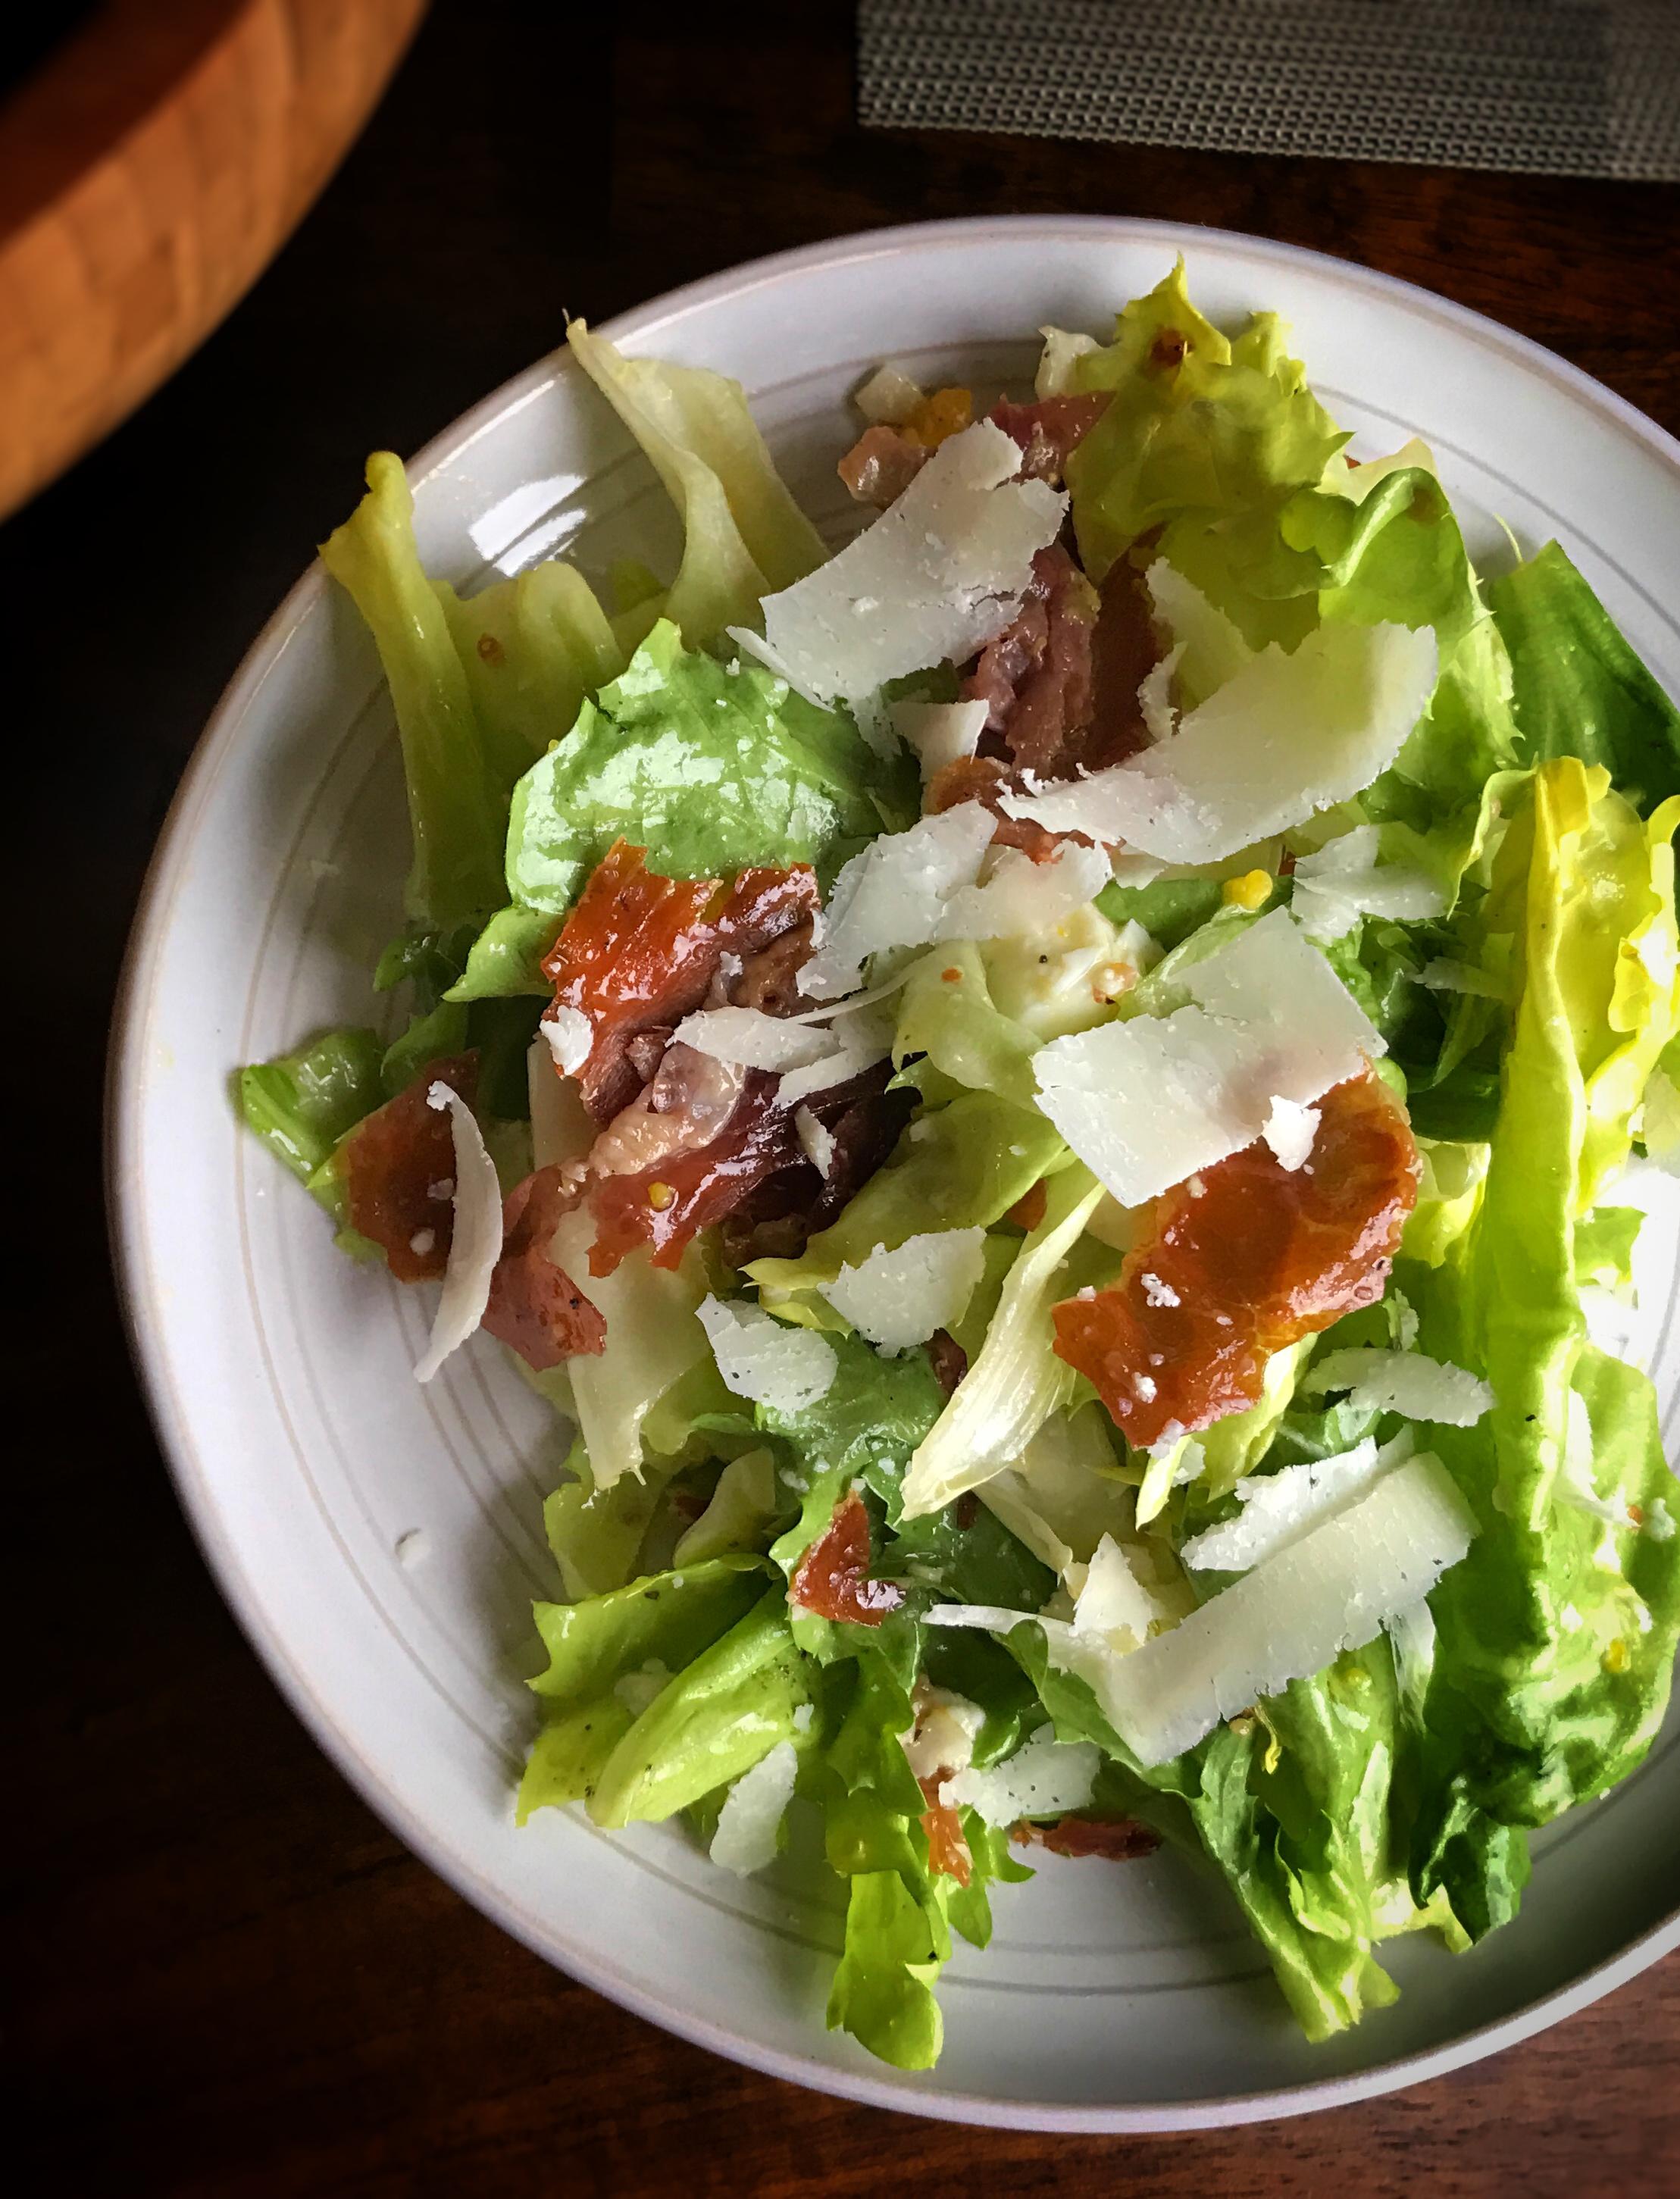 Escarole Salad with Crispy Prosciutto, Egg and Parmesan